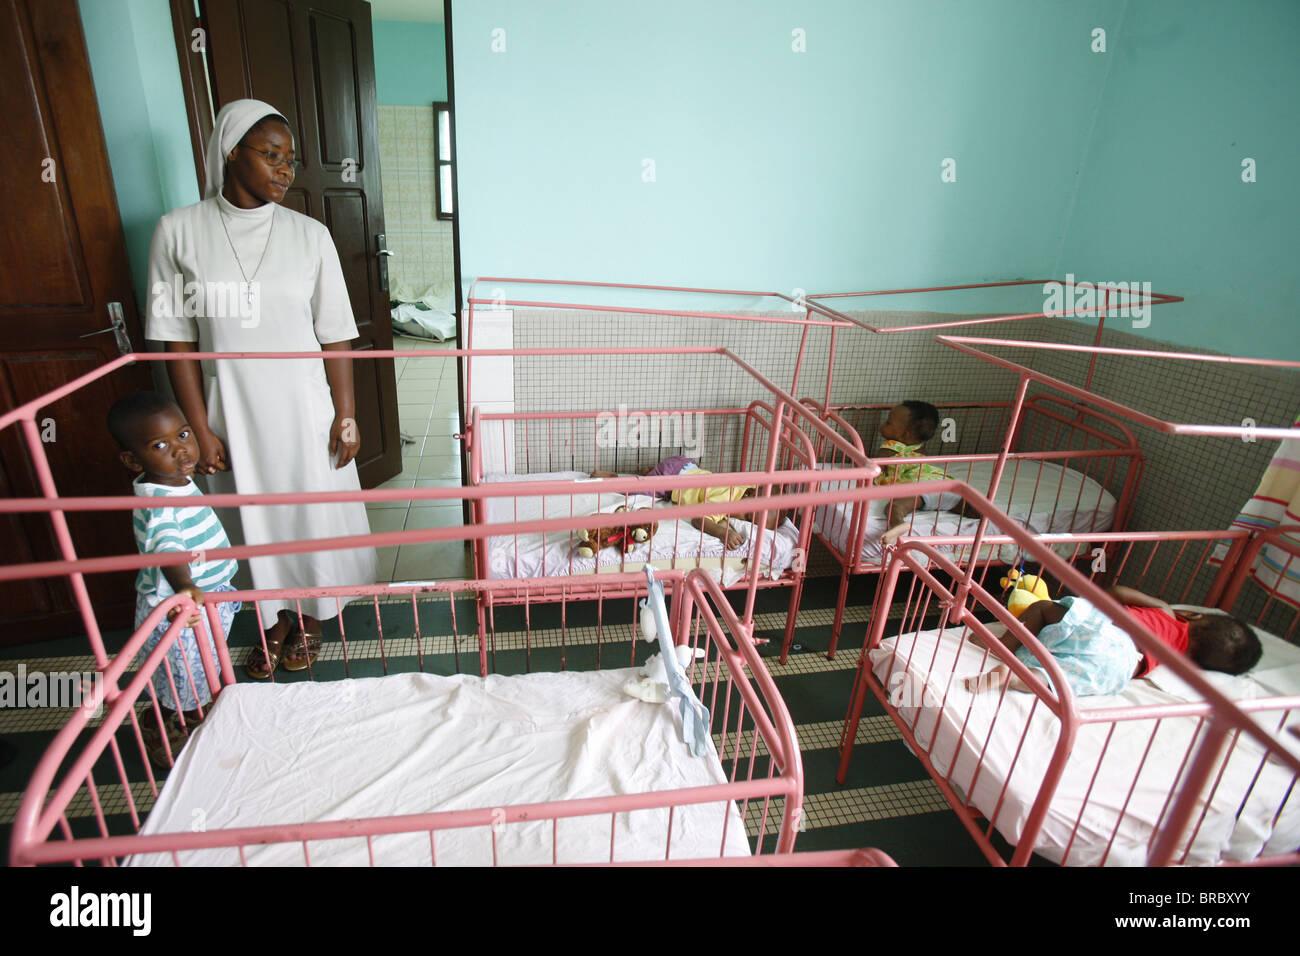 Nursery and kindergarten run by Catholic nuns, Lome, Togo, West Africa - Stock Image